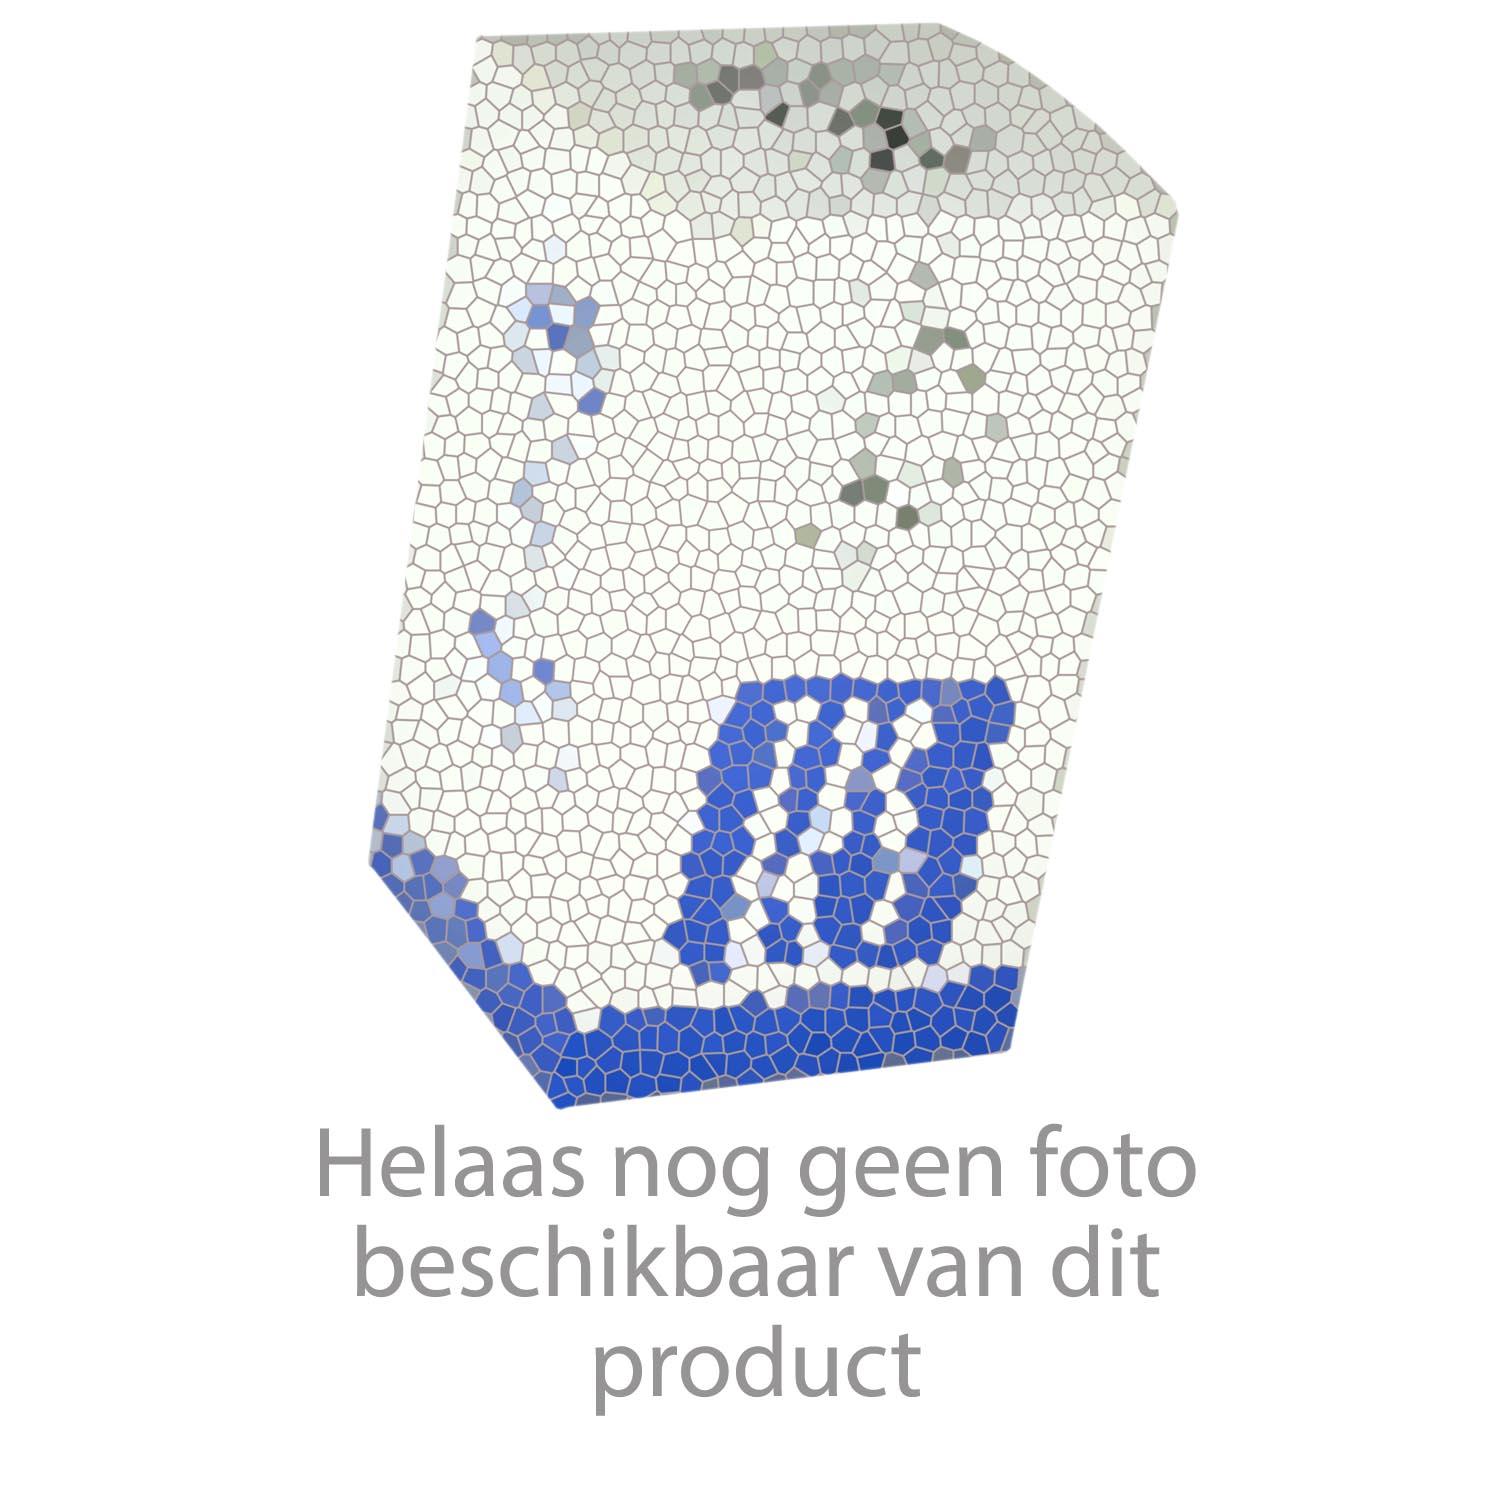 Grohe onderdelen Euphoria Cube+ Handdouche 94 L/M 27888000